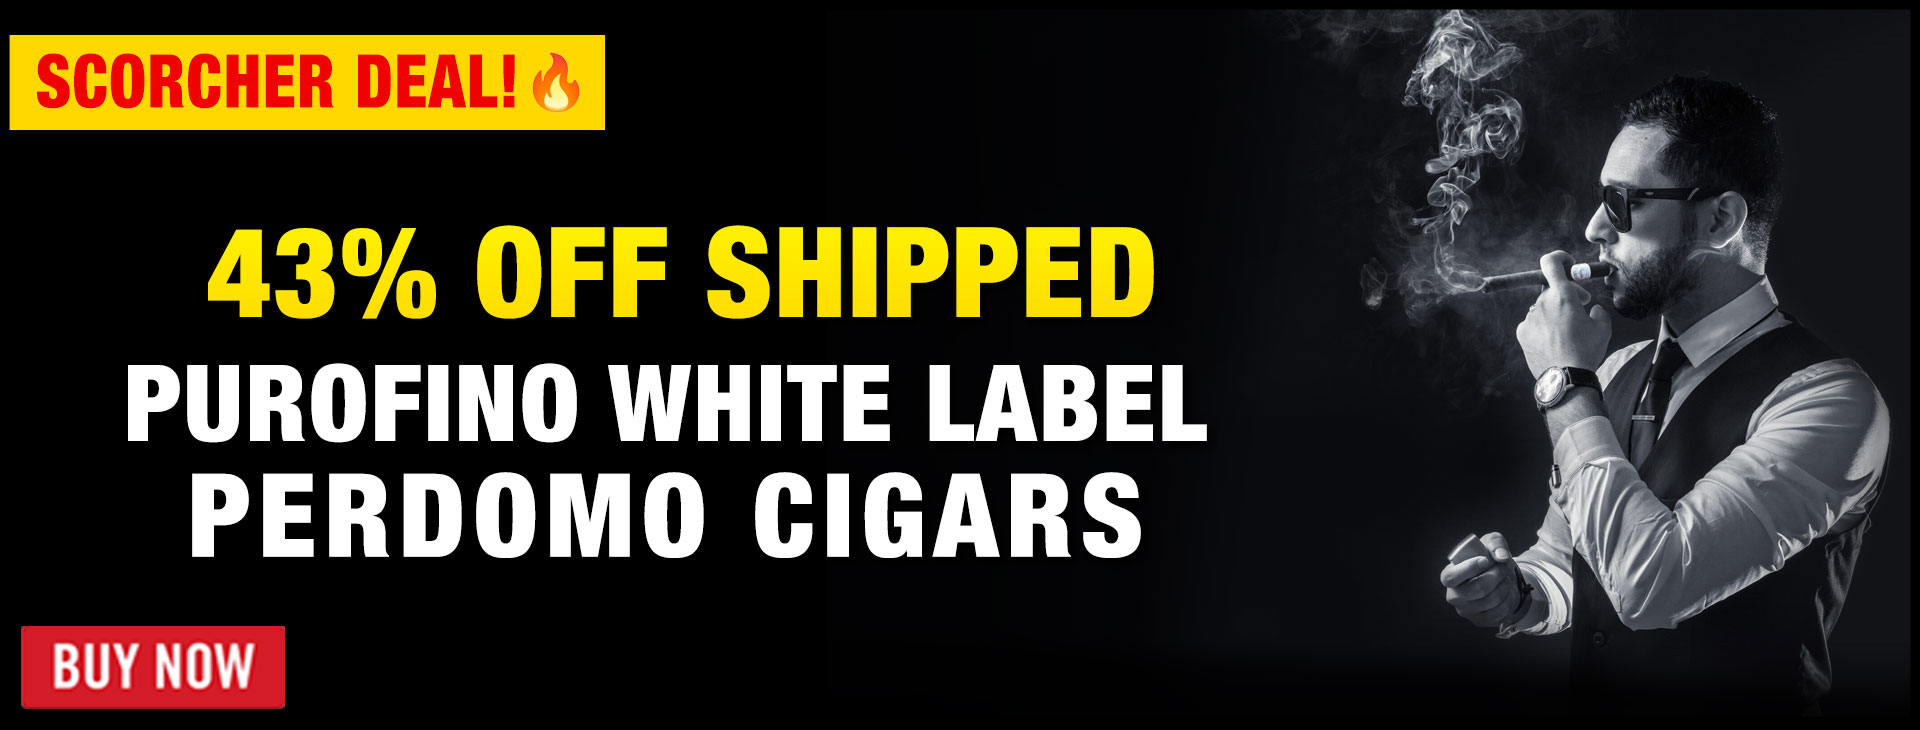 purofino-white-label-20212-banner.jpg